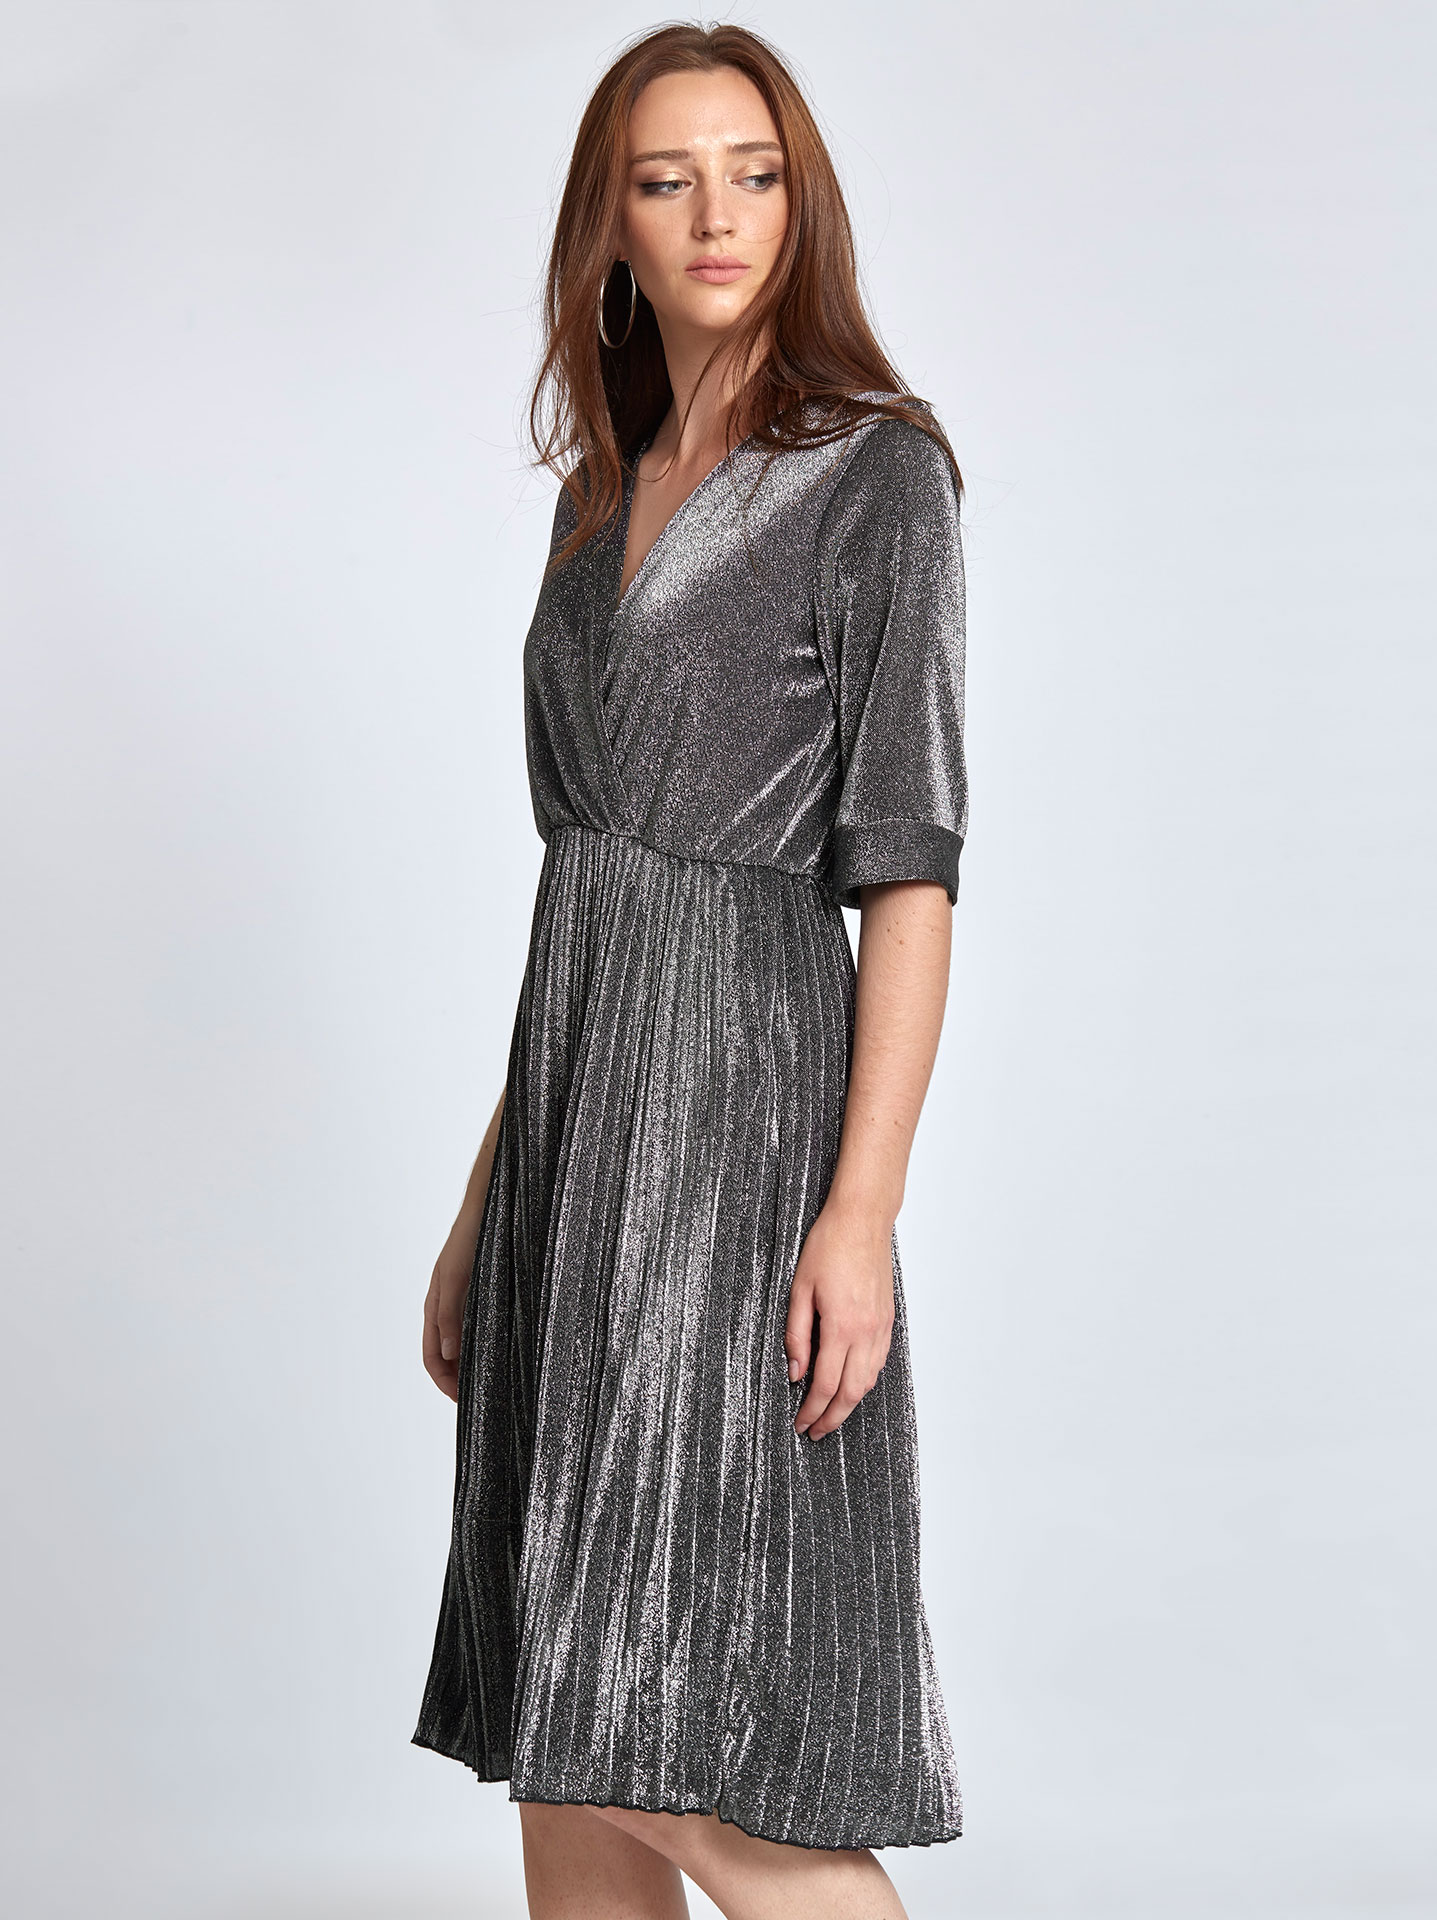 66c3e10c683 Μεταλλιζέ πλισέ φόρεμα σε γκρι σκουρο, 16,95€ | Celestino